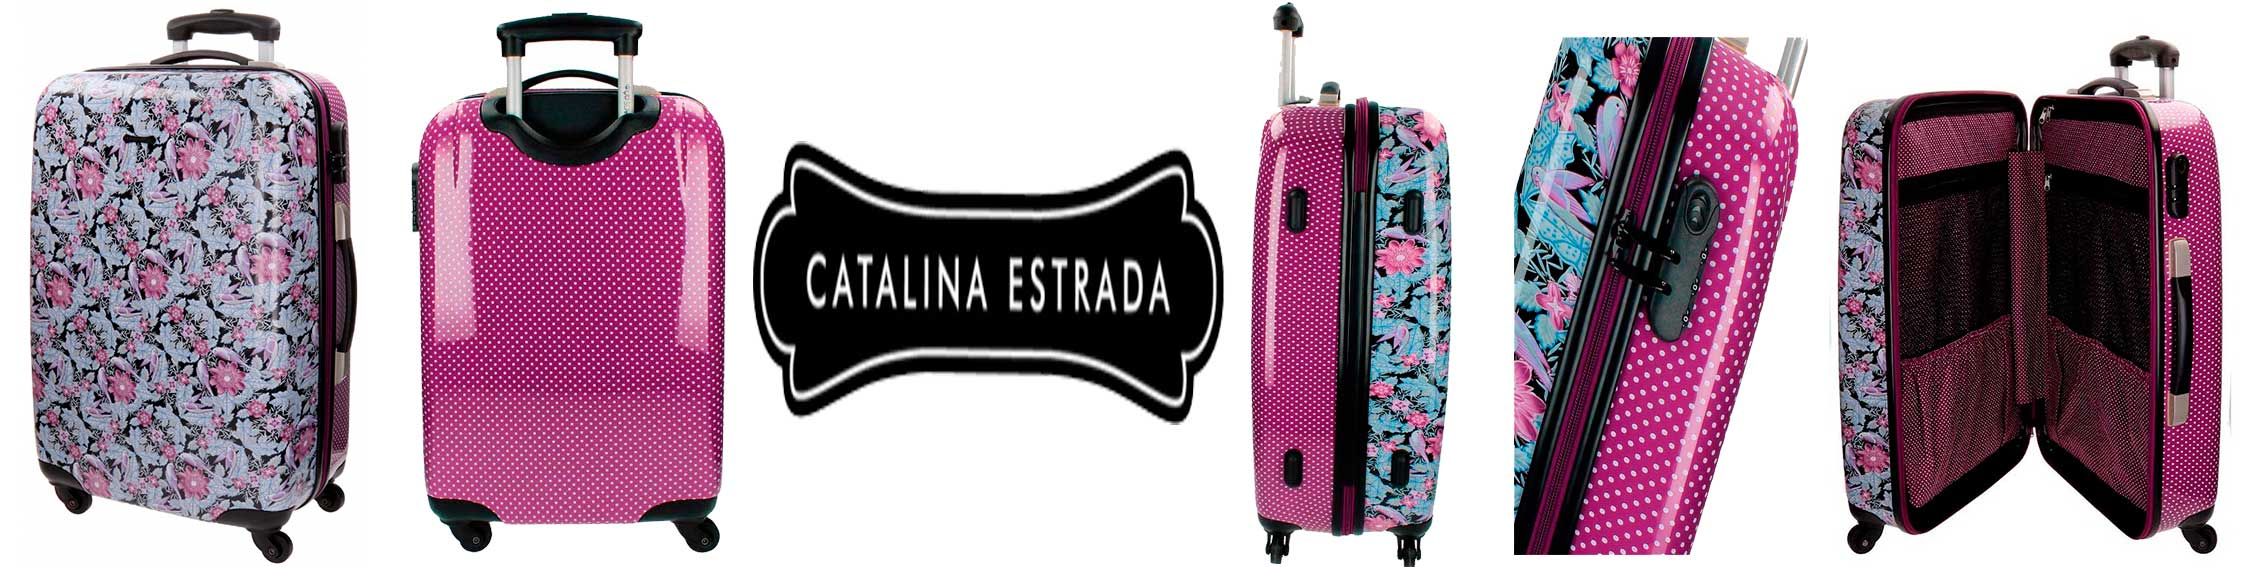 Maletas Catalina Estrada